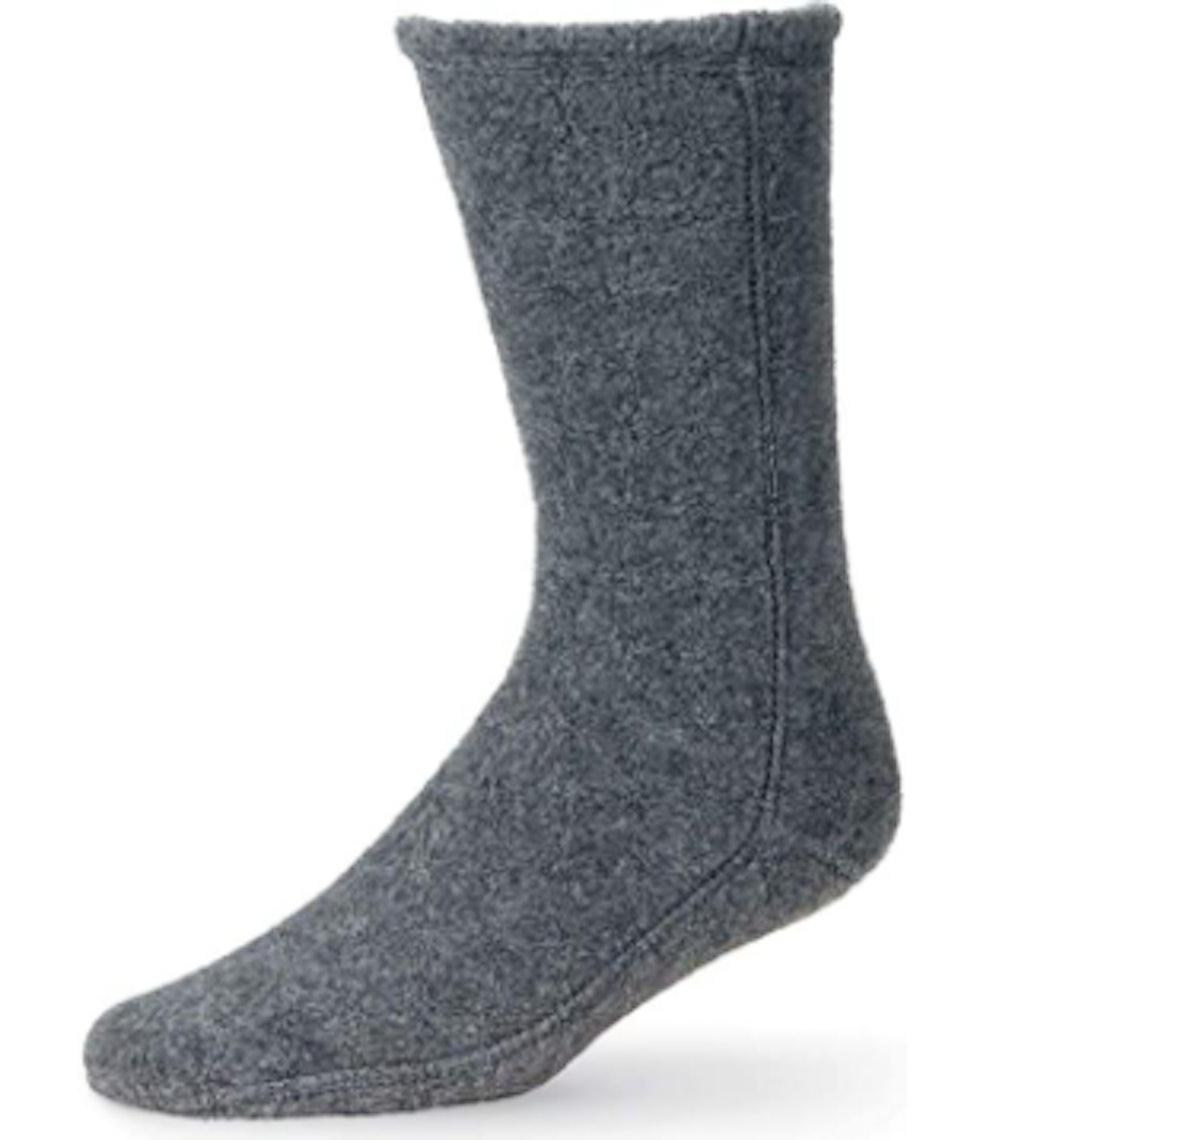 Acorn Versafit Mid-Calf Fleece Socks